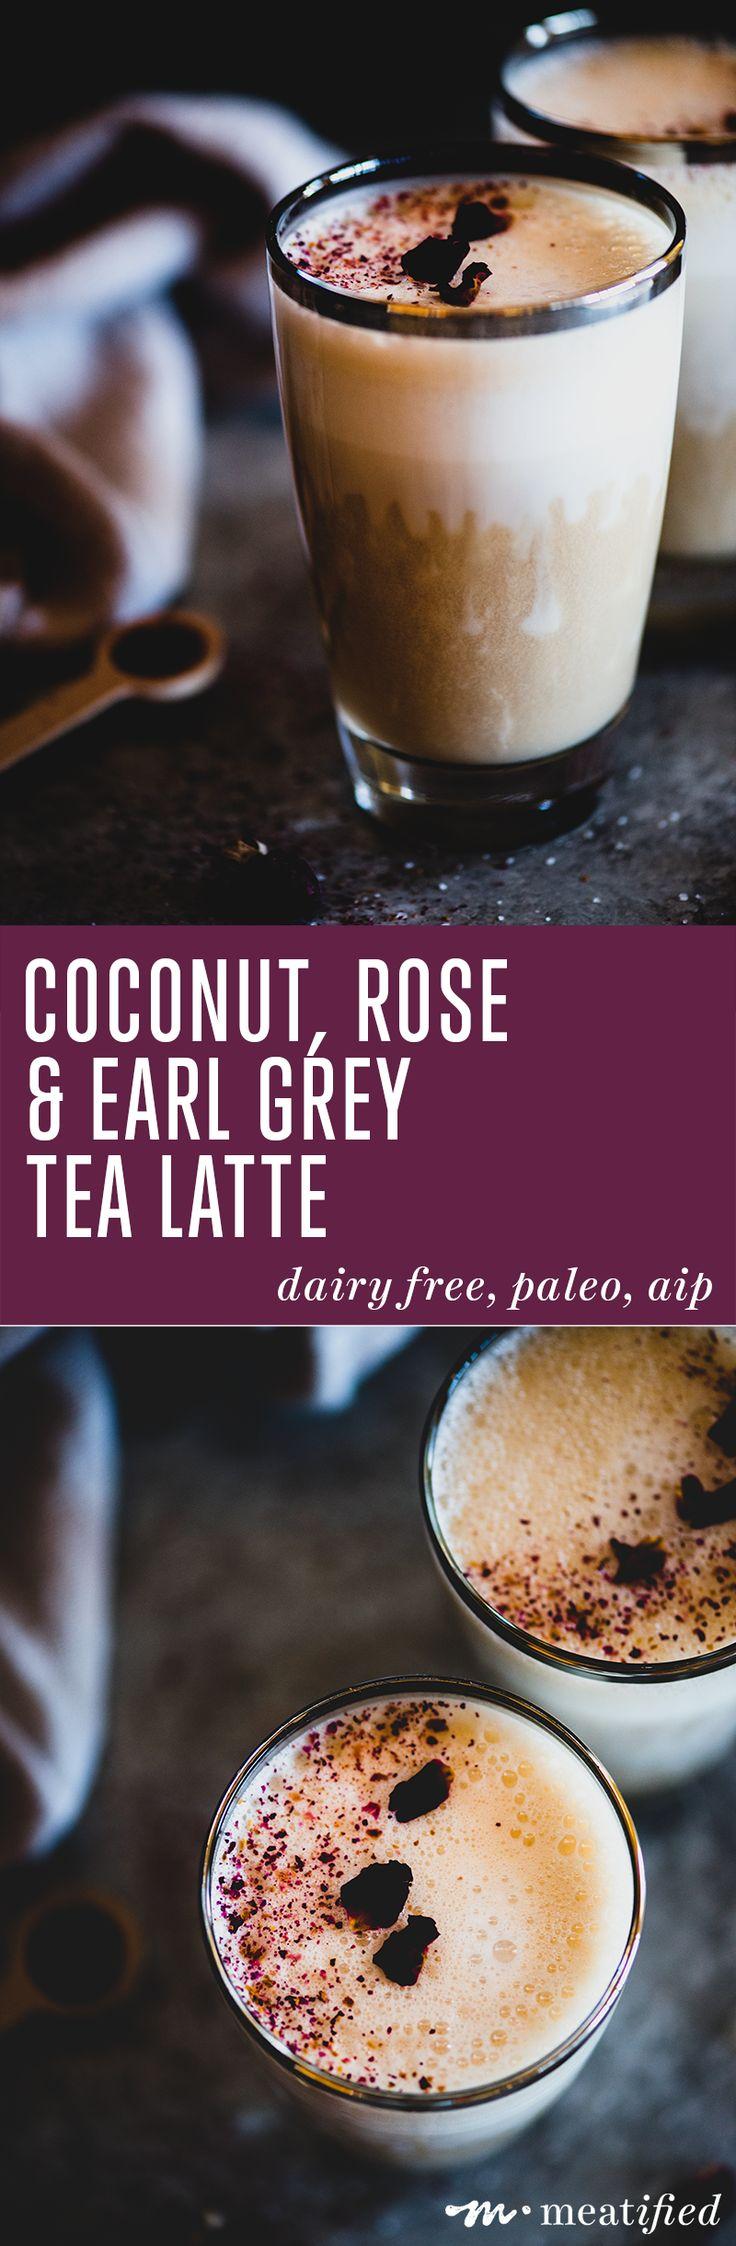 Paleo Vegan Coconut, Rose & Earl Grey Tea Latte | Meatified